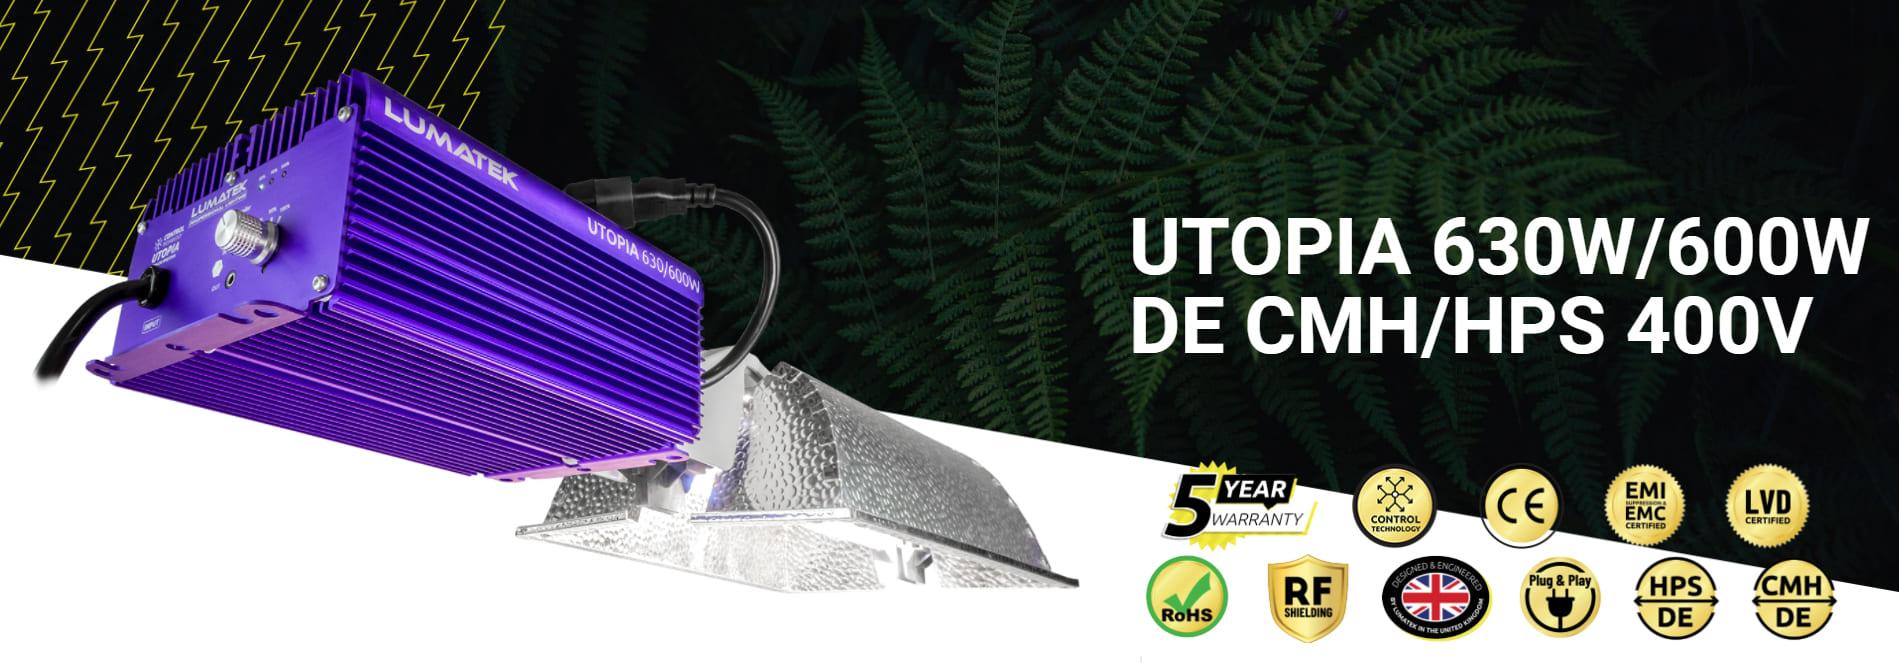 Lumatek Utopia 630W De Cmh Hps 400V 08